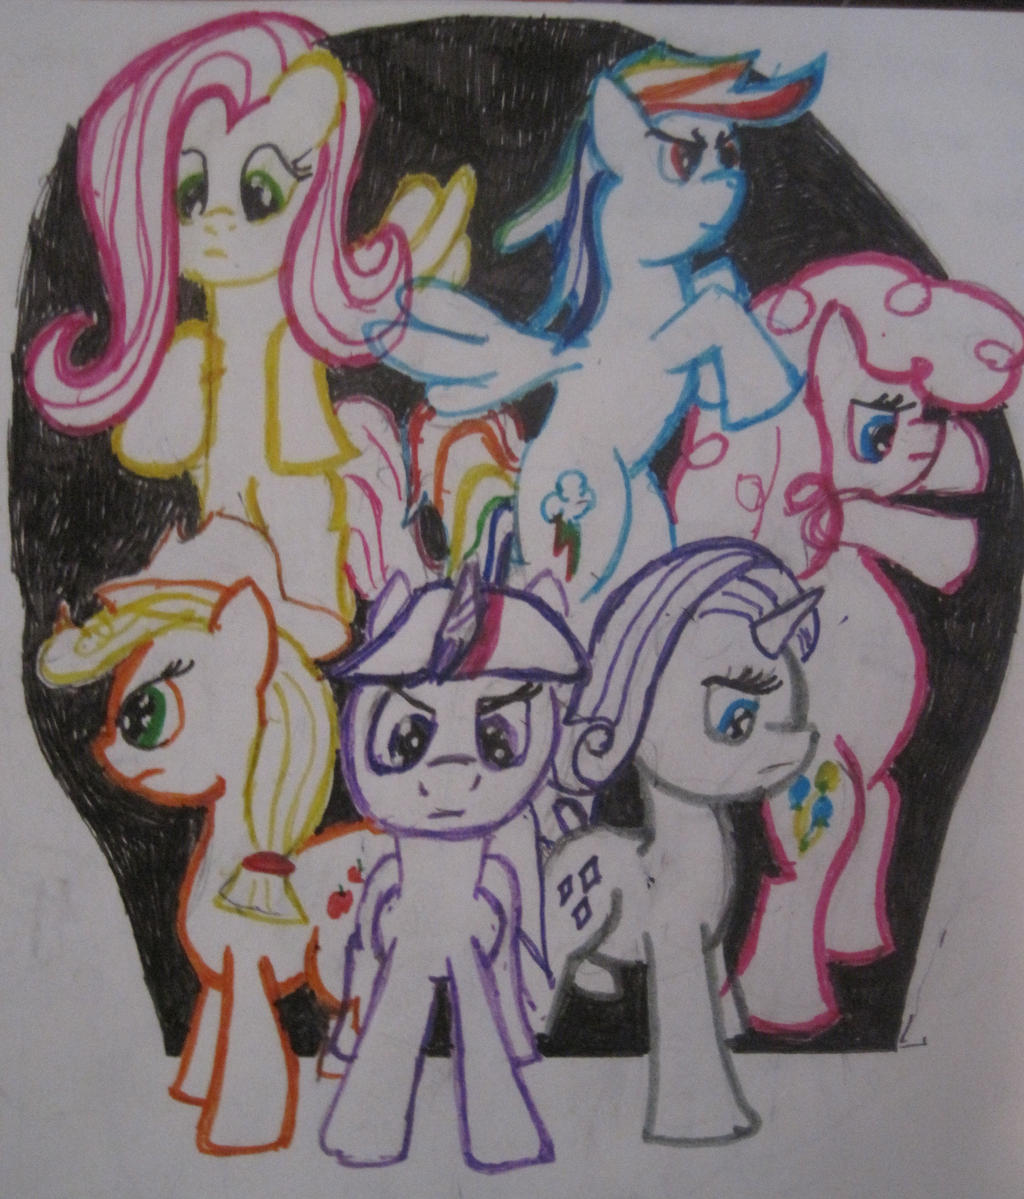 Epic pony pose by ShadowDash1901